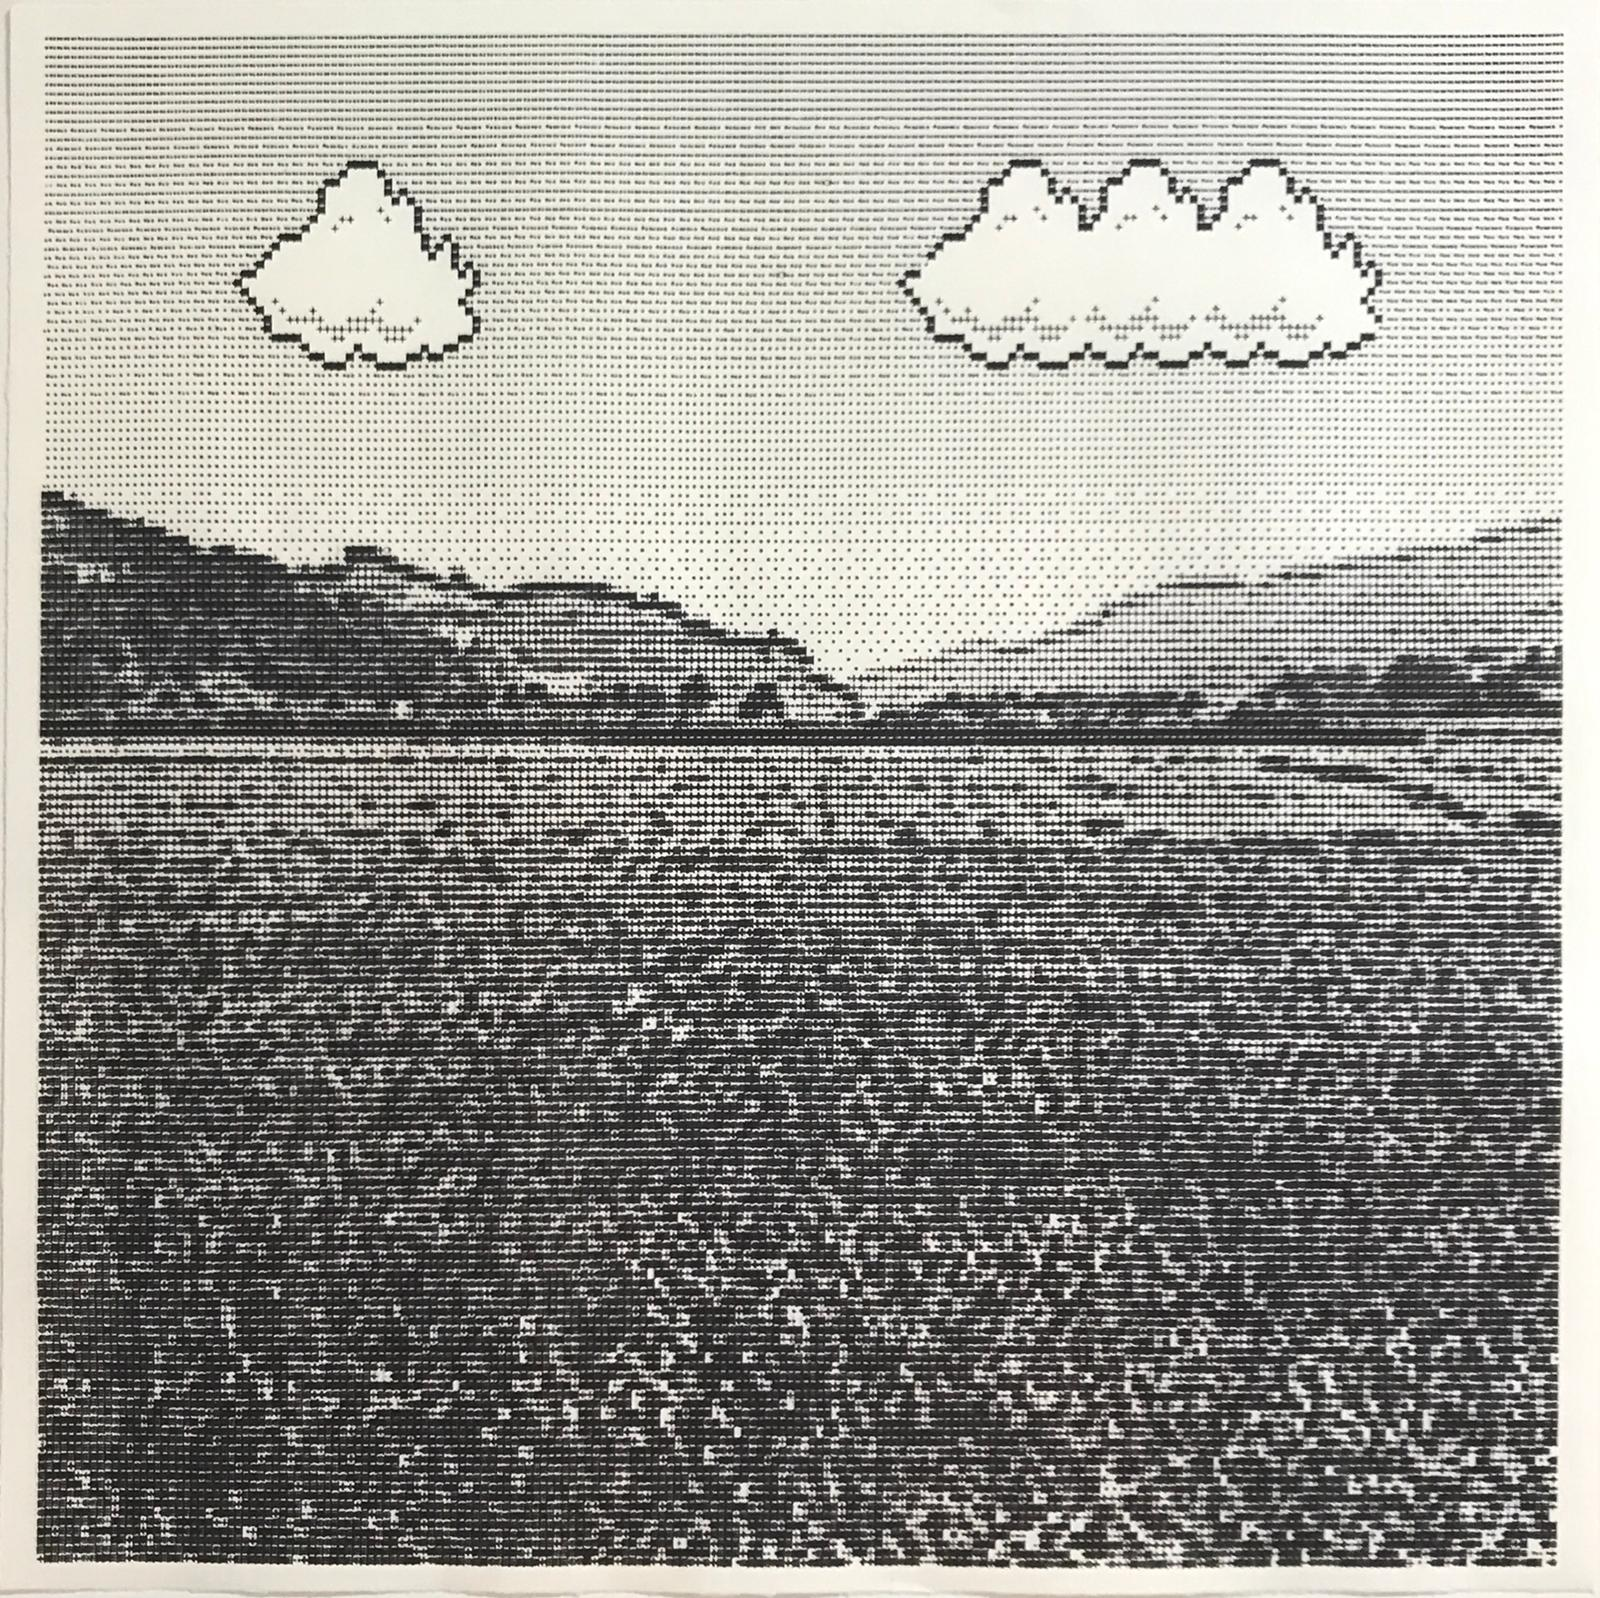 Arno Beck, 'Untitled', typewriter-drawing on japanese paper, 45 cm x 45 cm, 2017-18